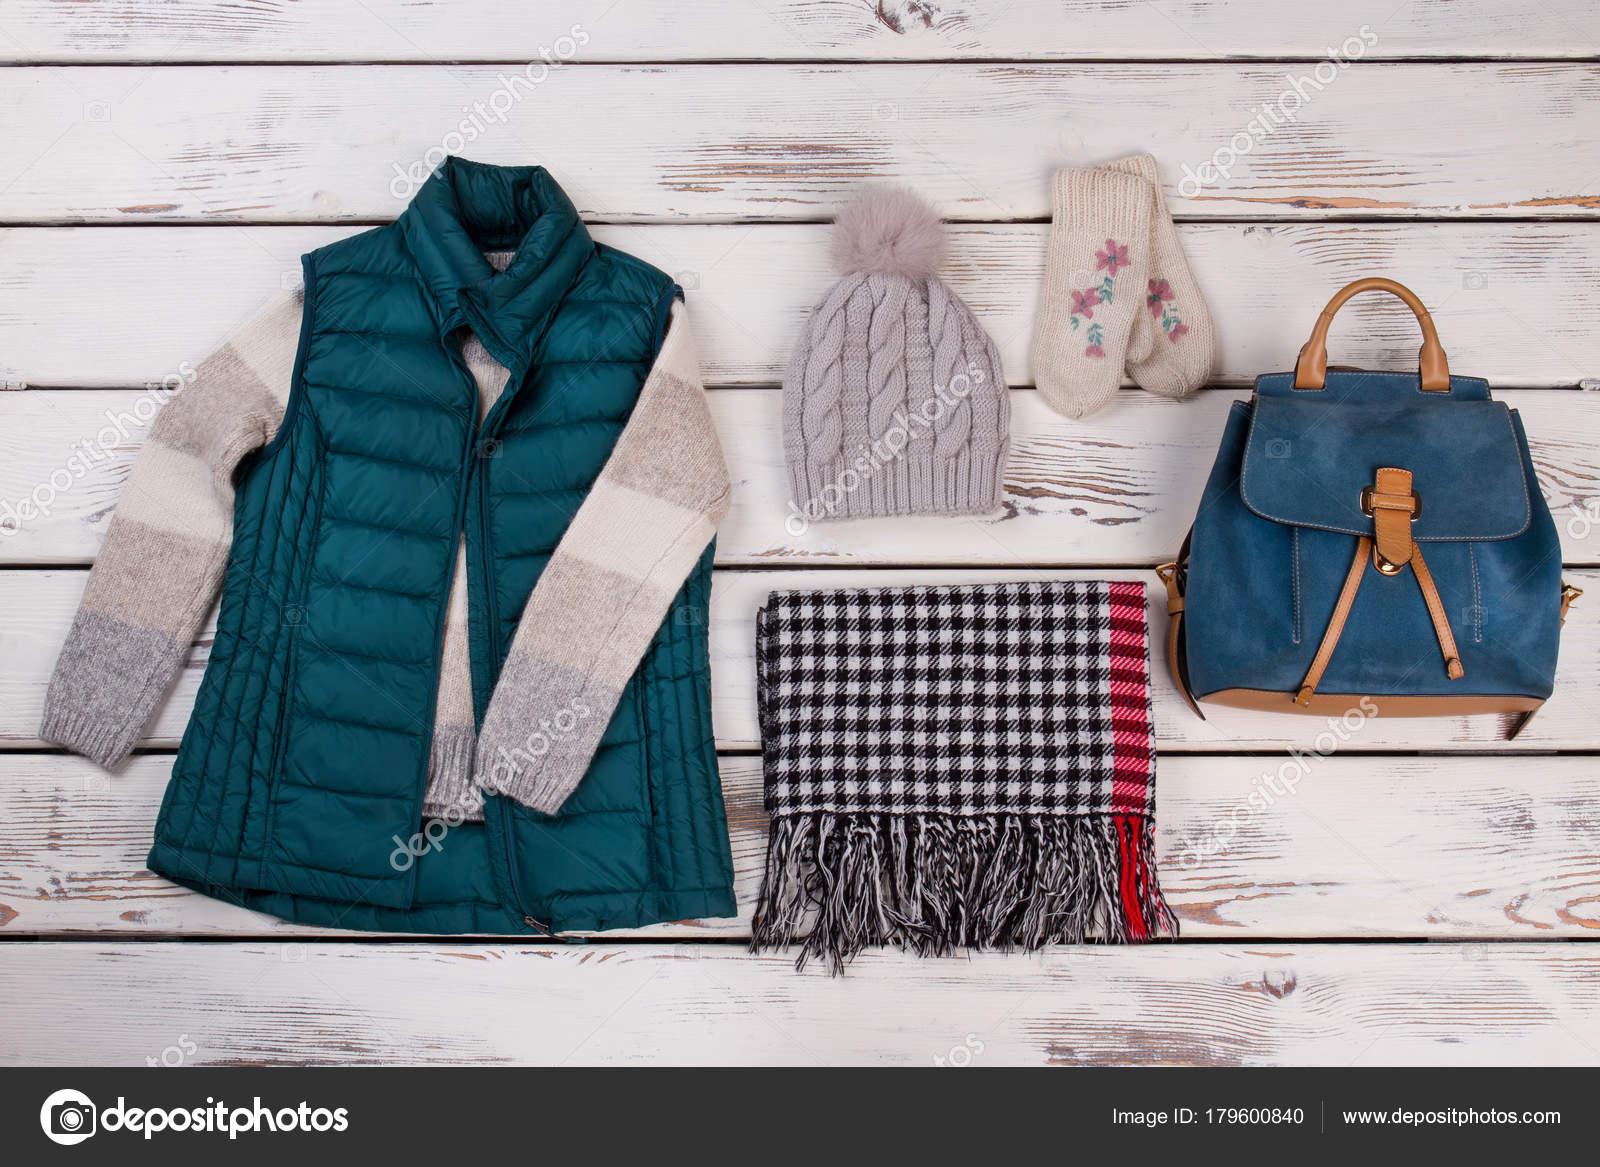 2037fff4205e Χειμωνιάτικα ρούχα και δερμάτινο σακίδιο — Φωτογραφία Αρχείου ...